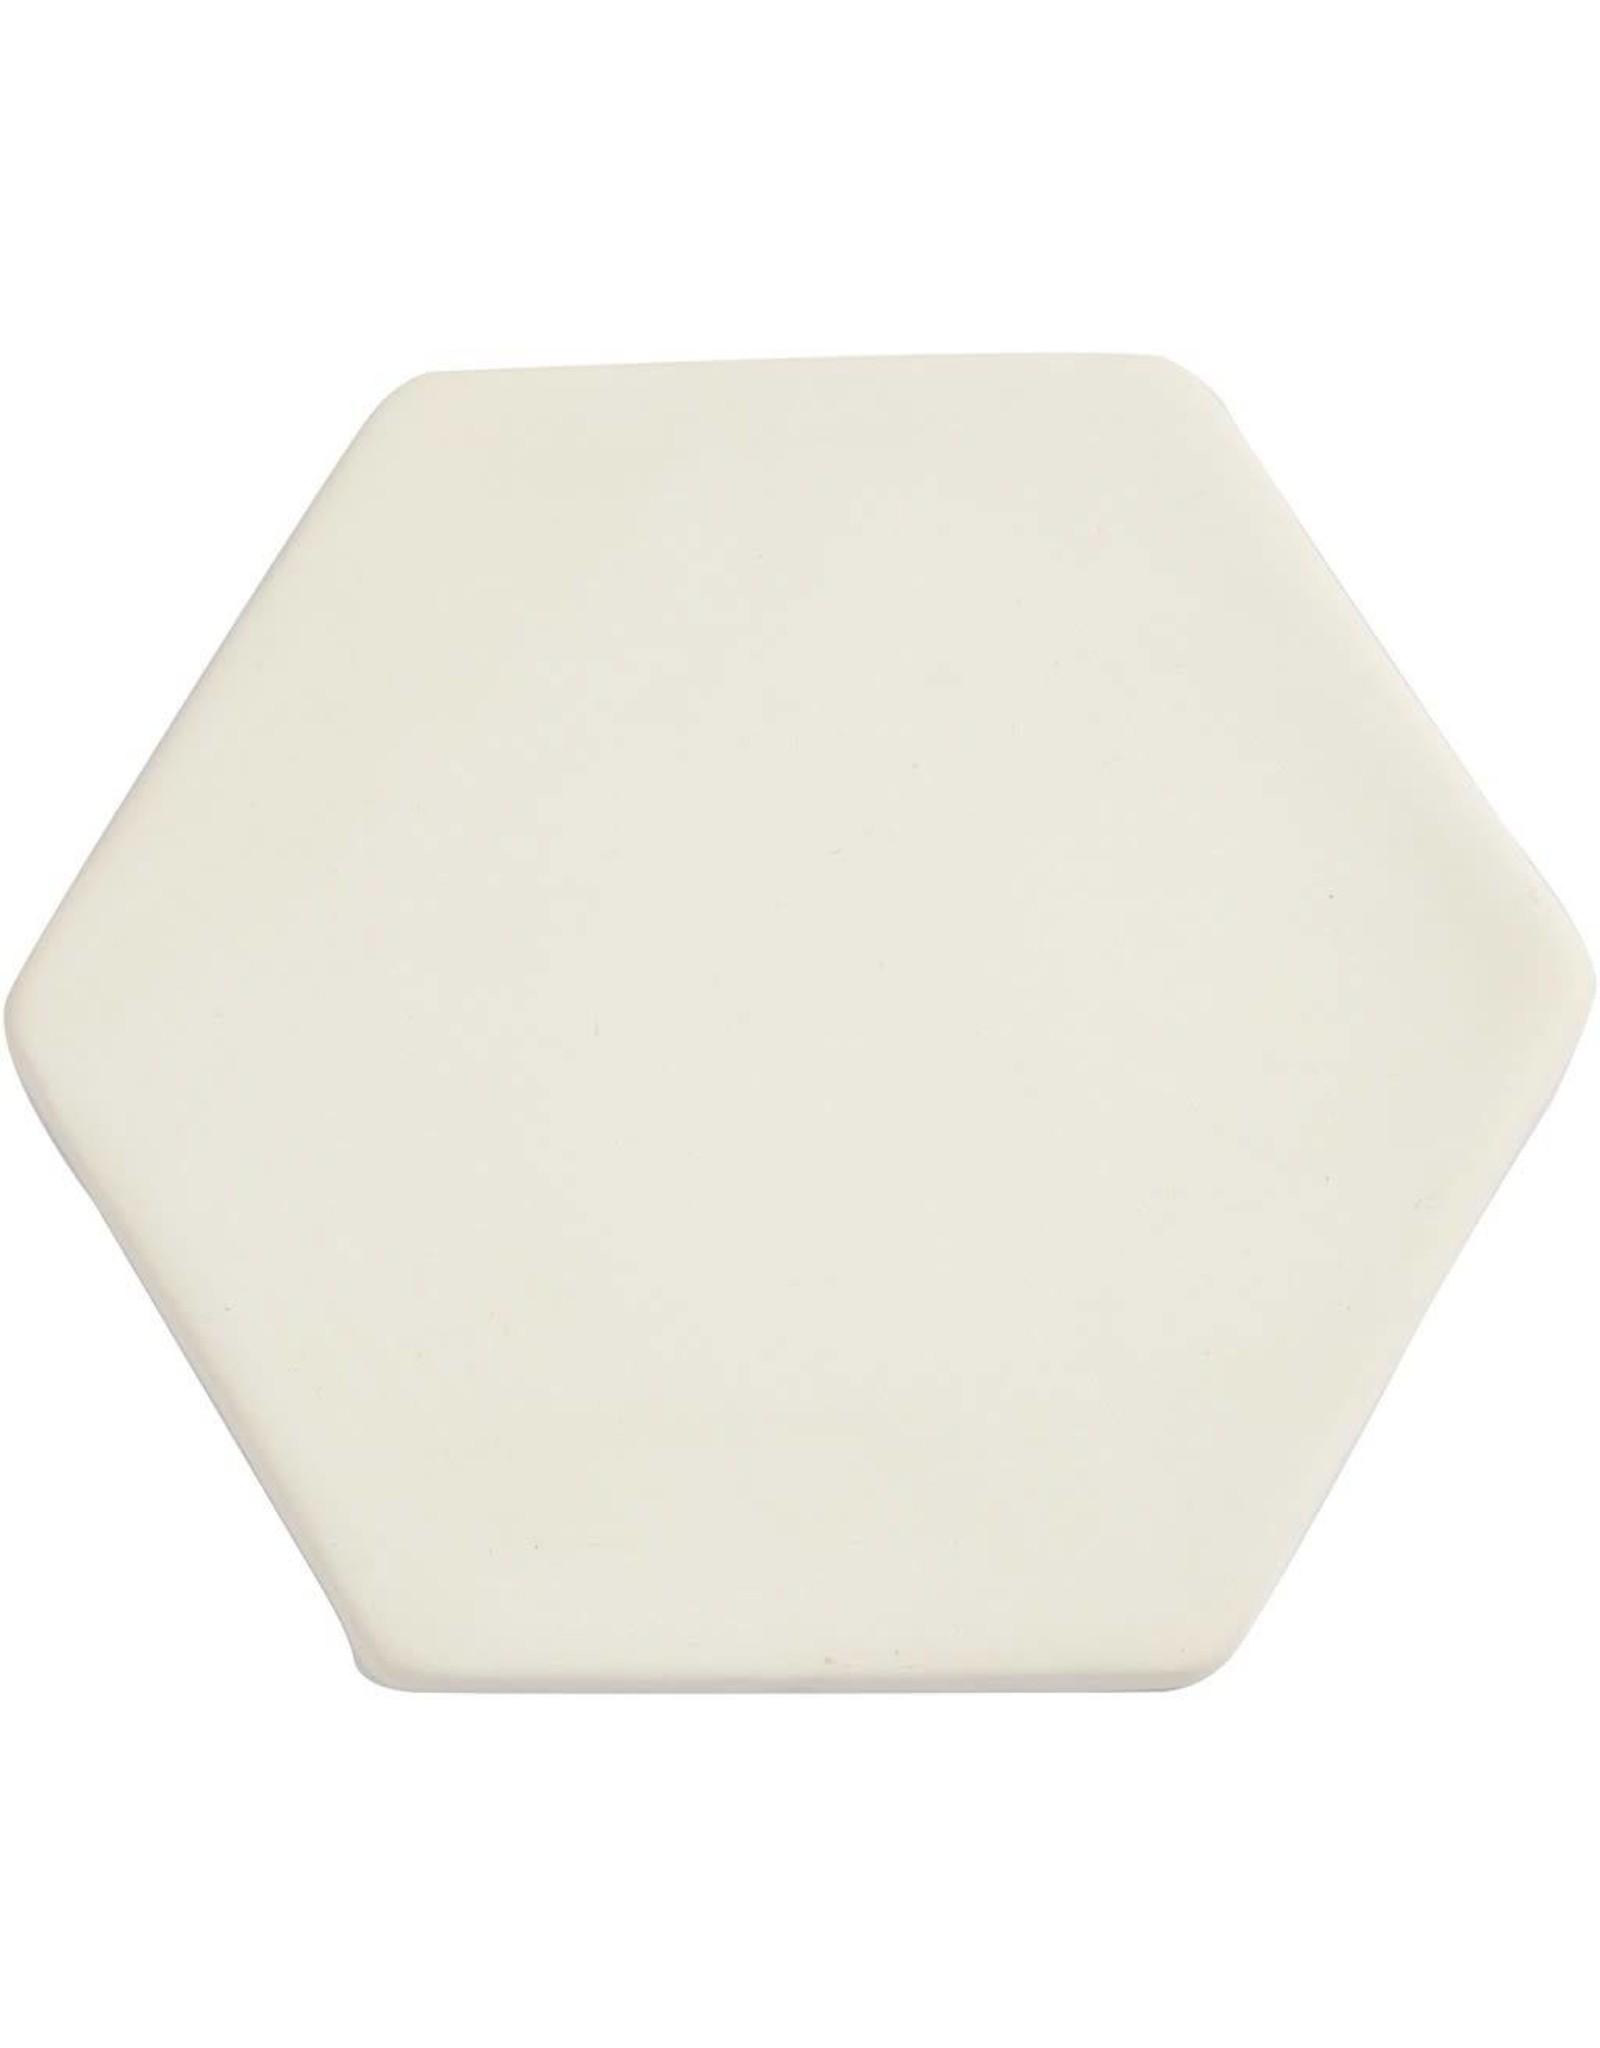 Creativ Company Kunst tegel, d: 13 cm, dikte 0,7 cm, wit